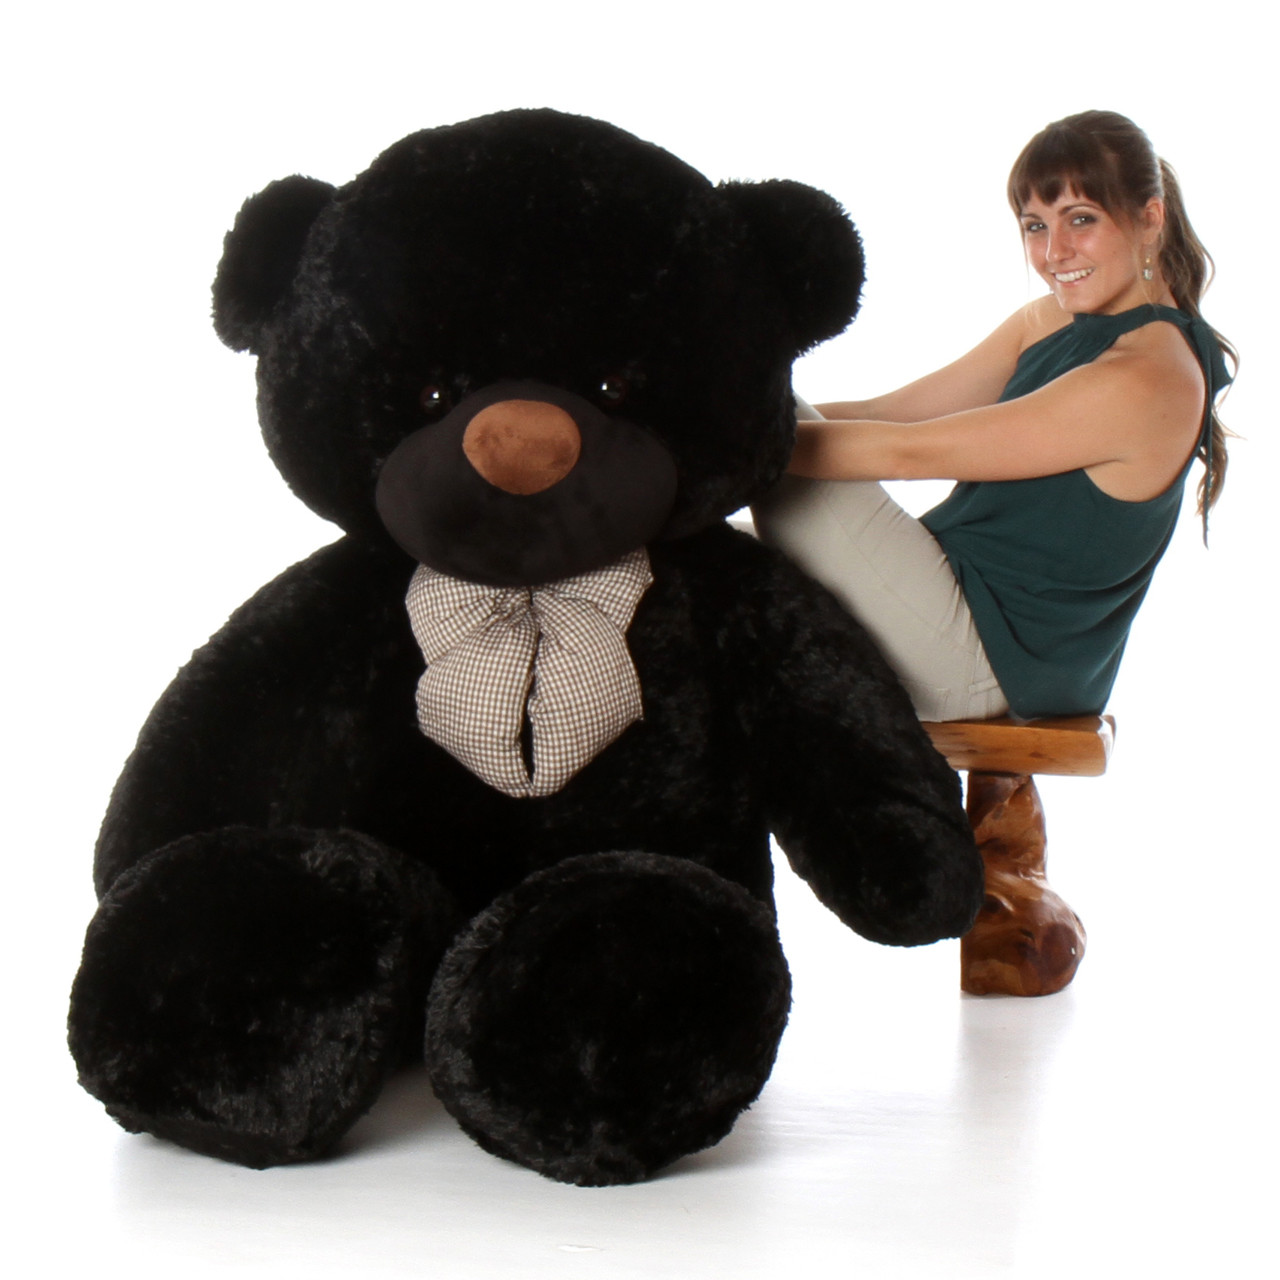 6ft Life Size Teddy Bear Juju Cuddles soft and huggable black bear